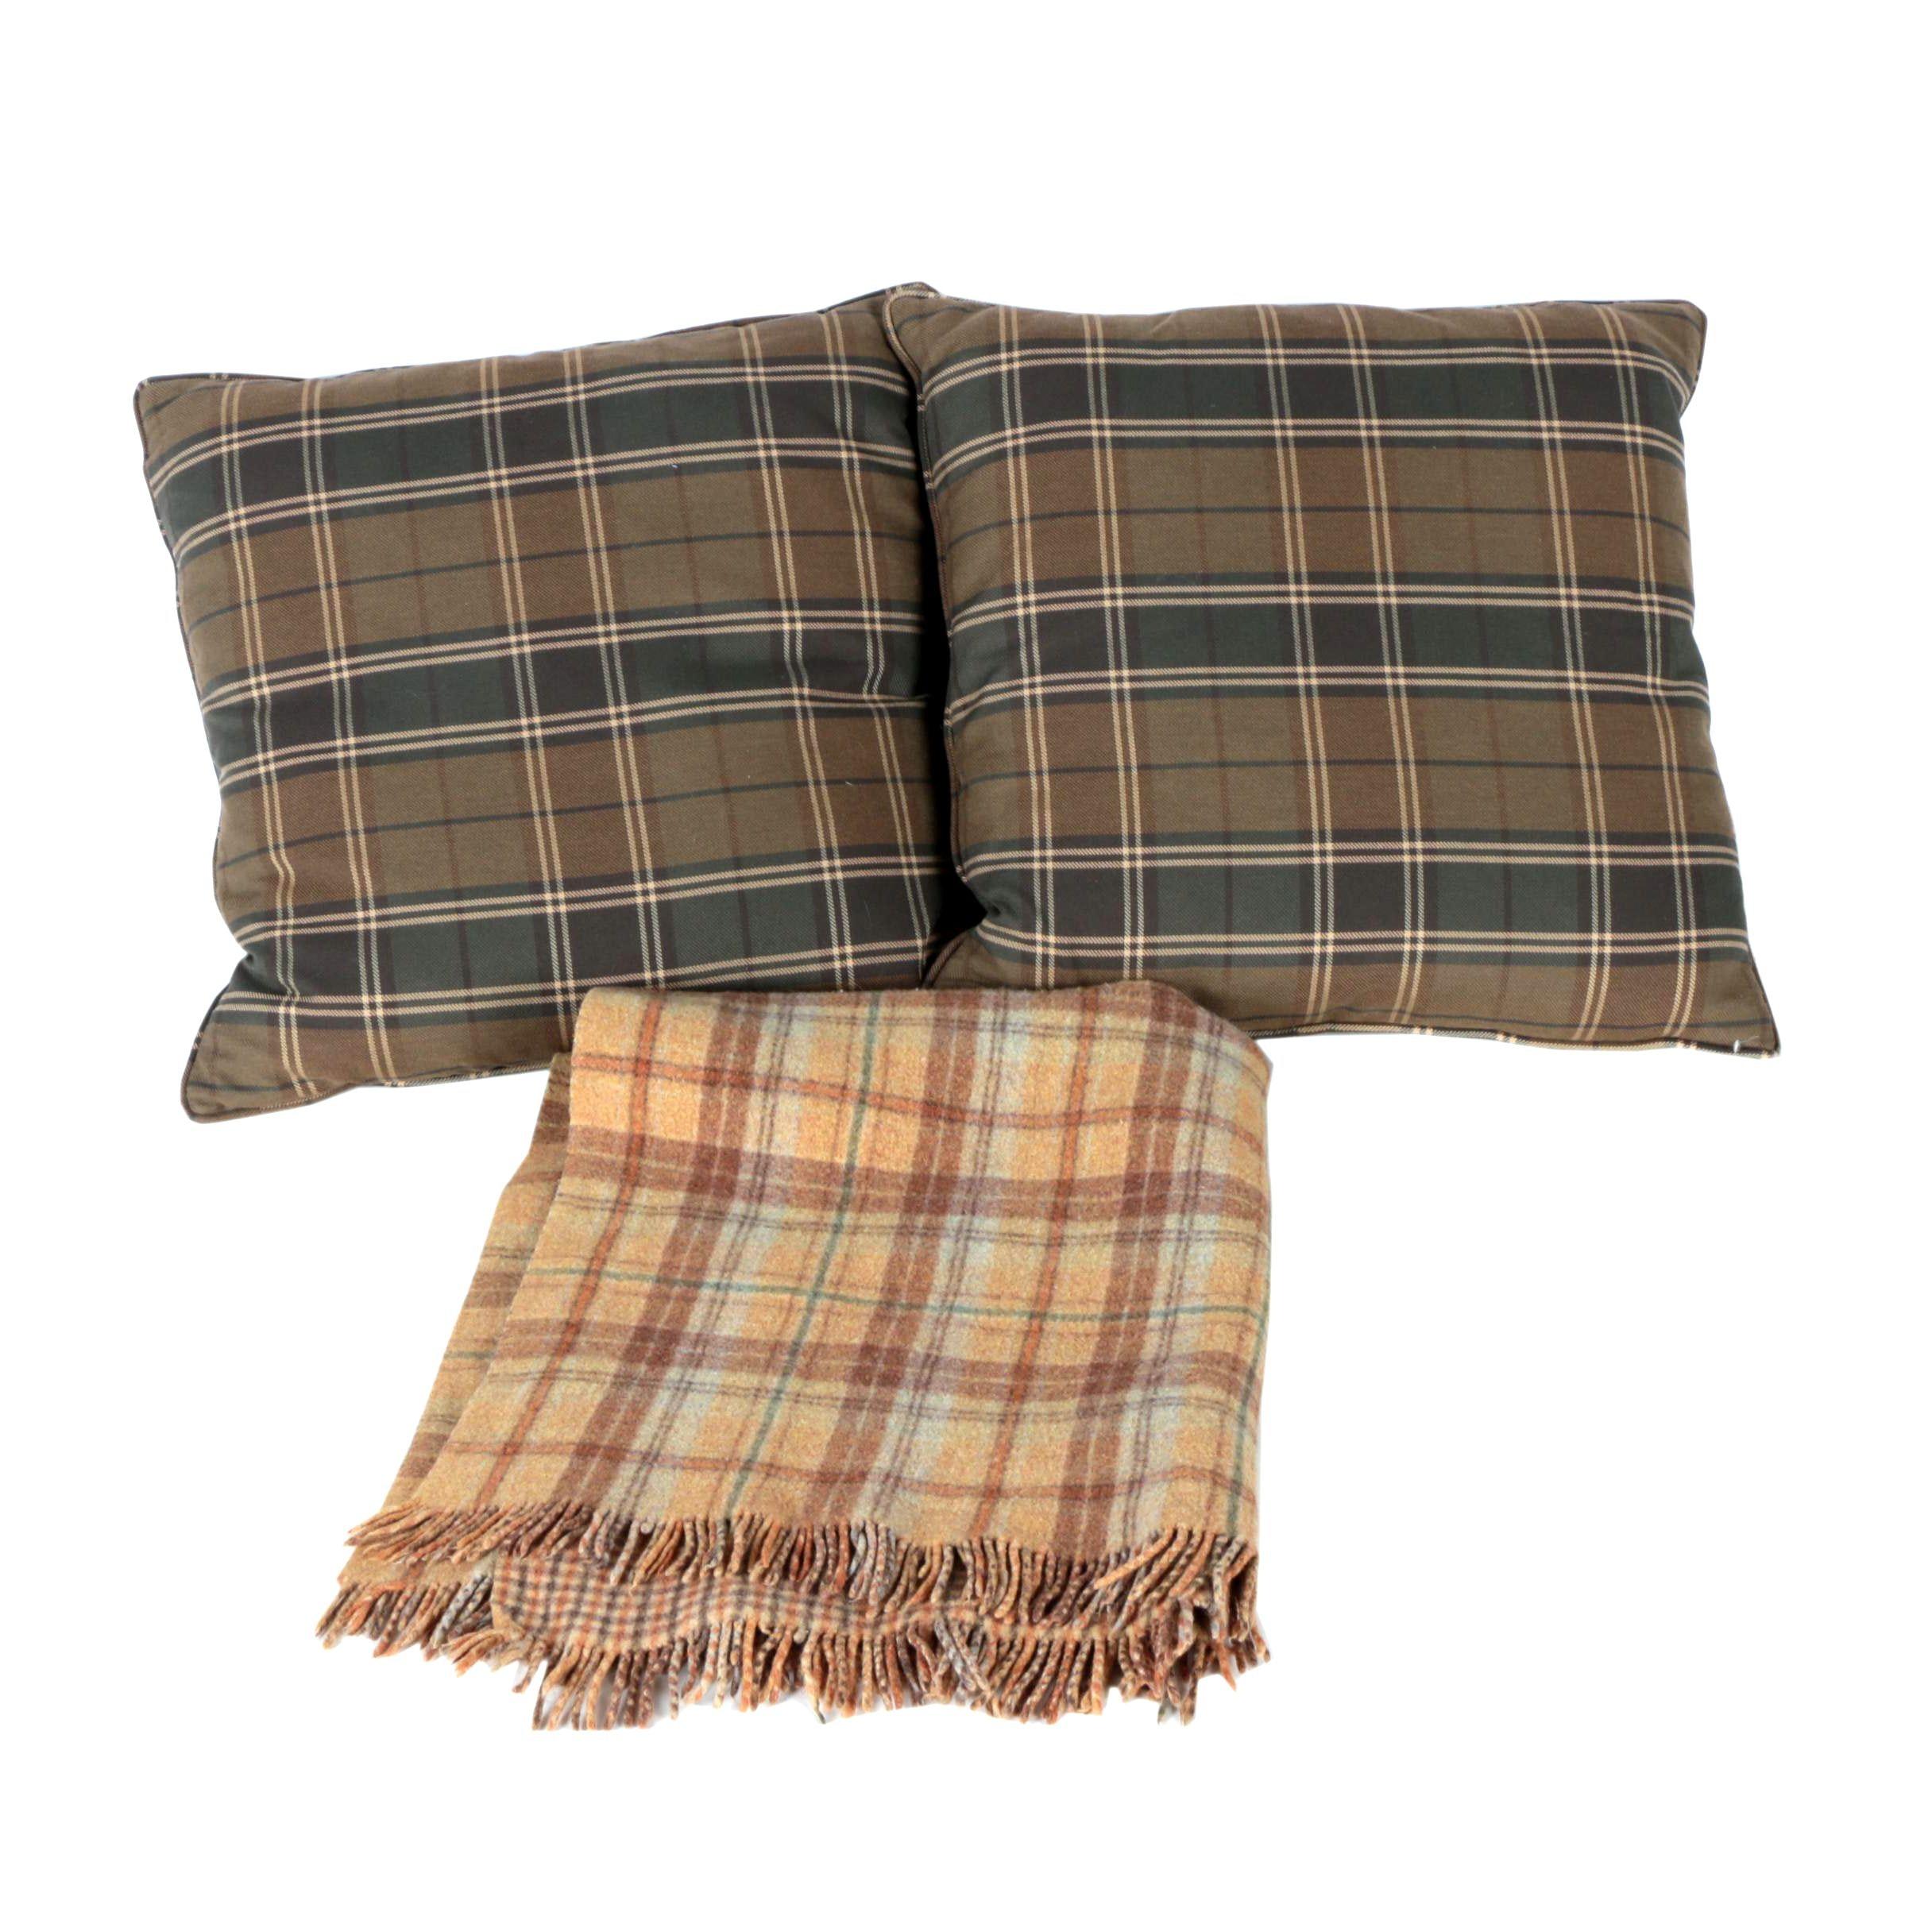 Williams-Sonoma Pillows And Throw Blanket